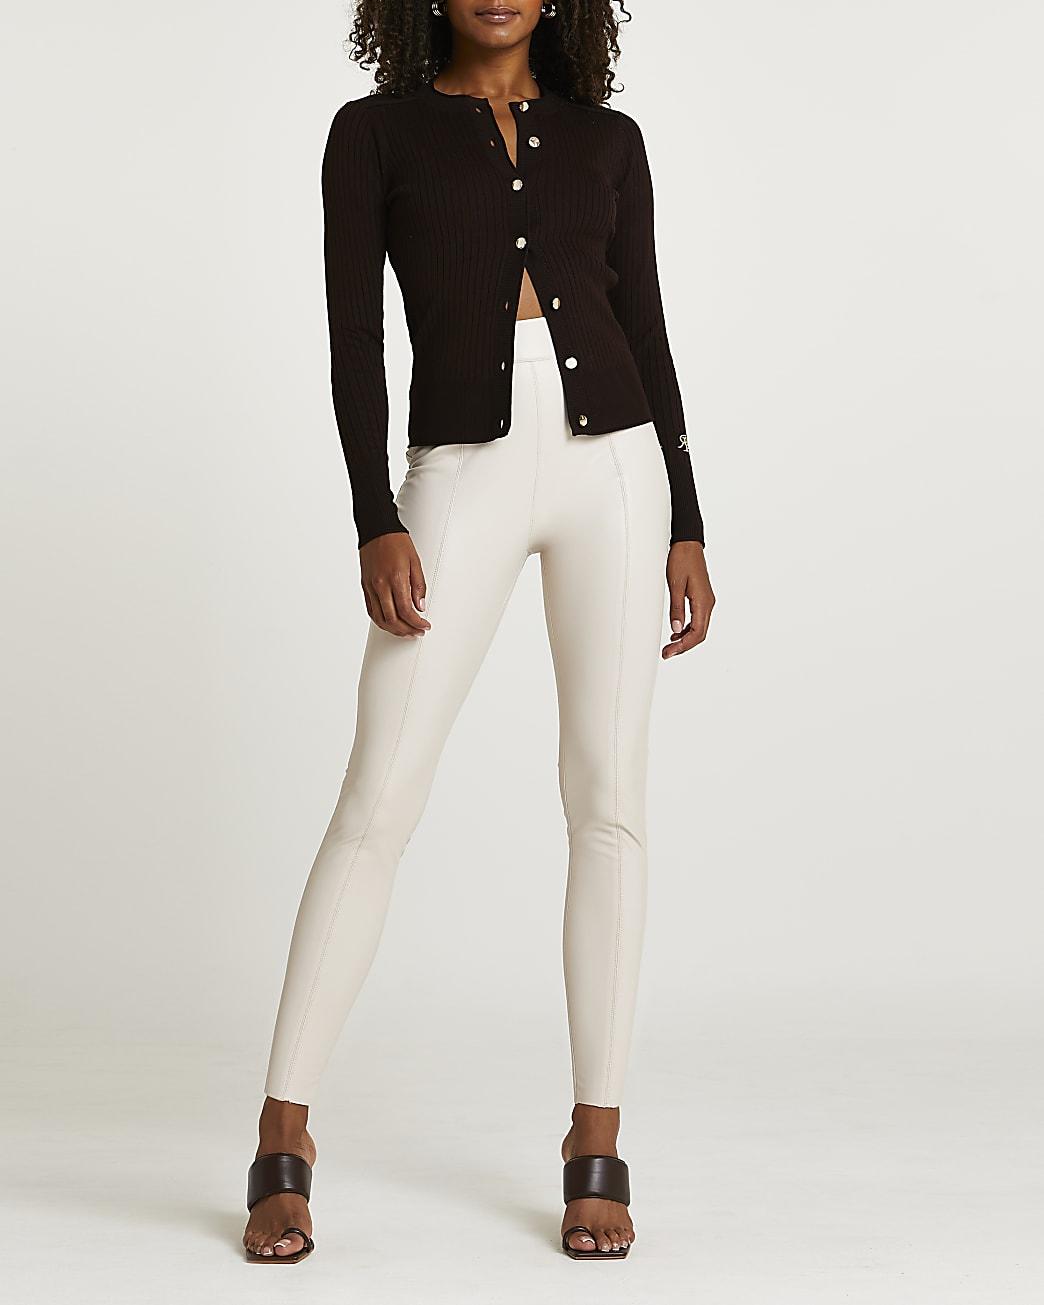 Beige faux leather skinny trousers